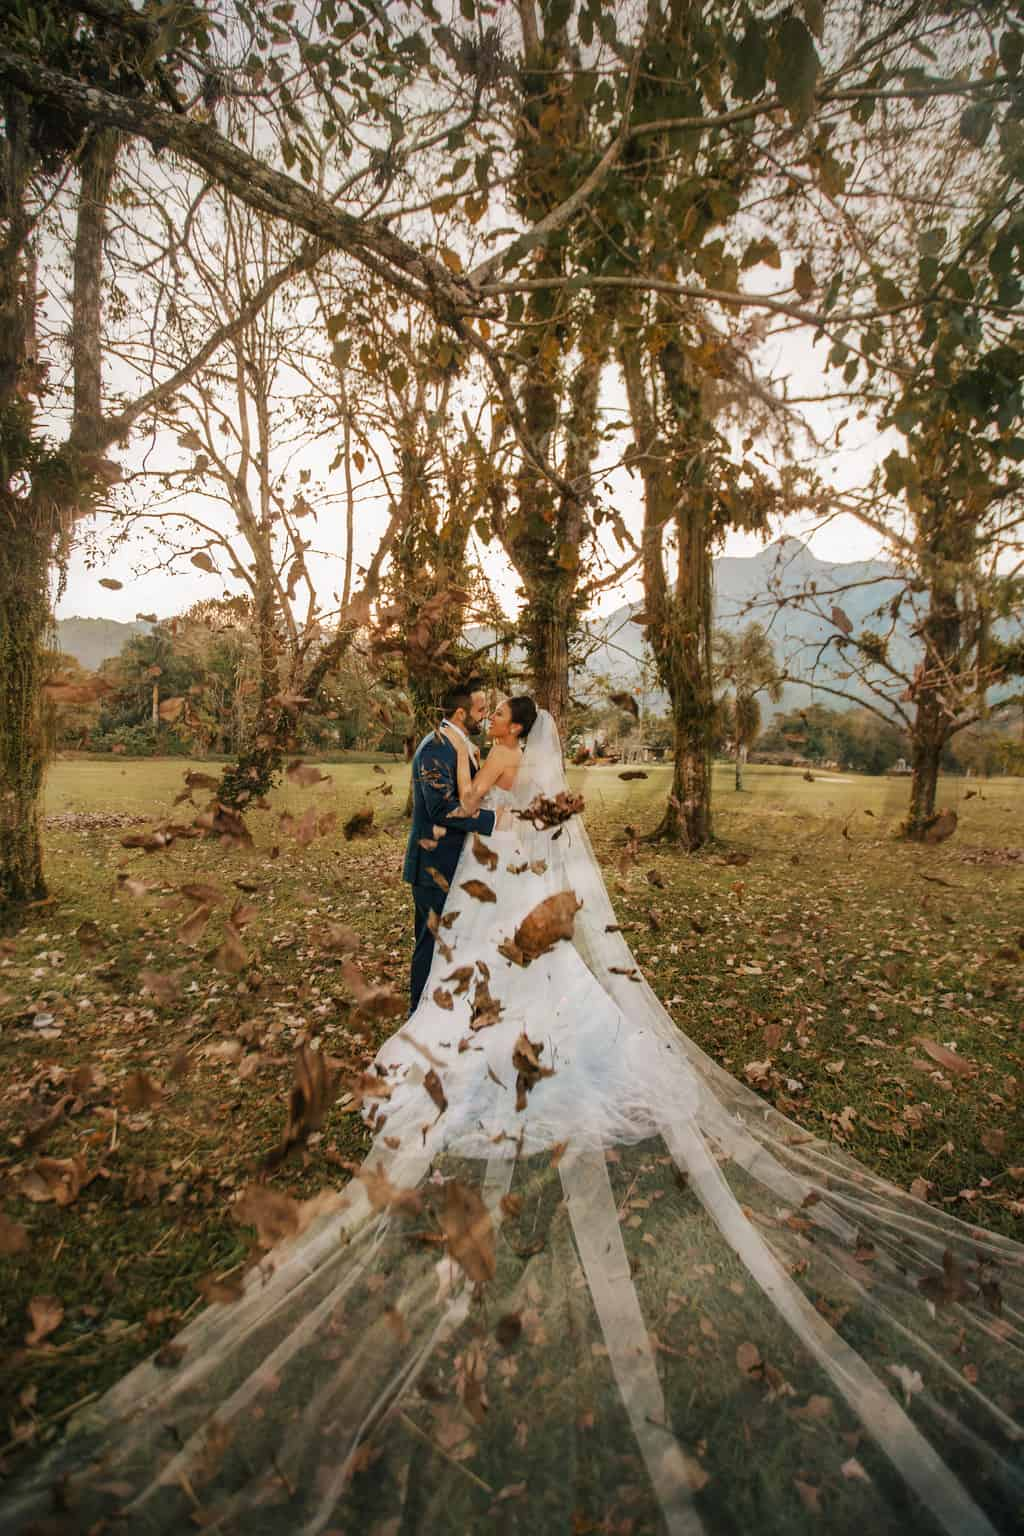 Casamento-Alissa-e-Gustavo-Cerimonial-Manu-Goncalez-Decor-Andrea-Kapps-Fasano-Angra-dos-Reis-Foto-VRebel-fotos-do-casal3561-Edit-Edit-1